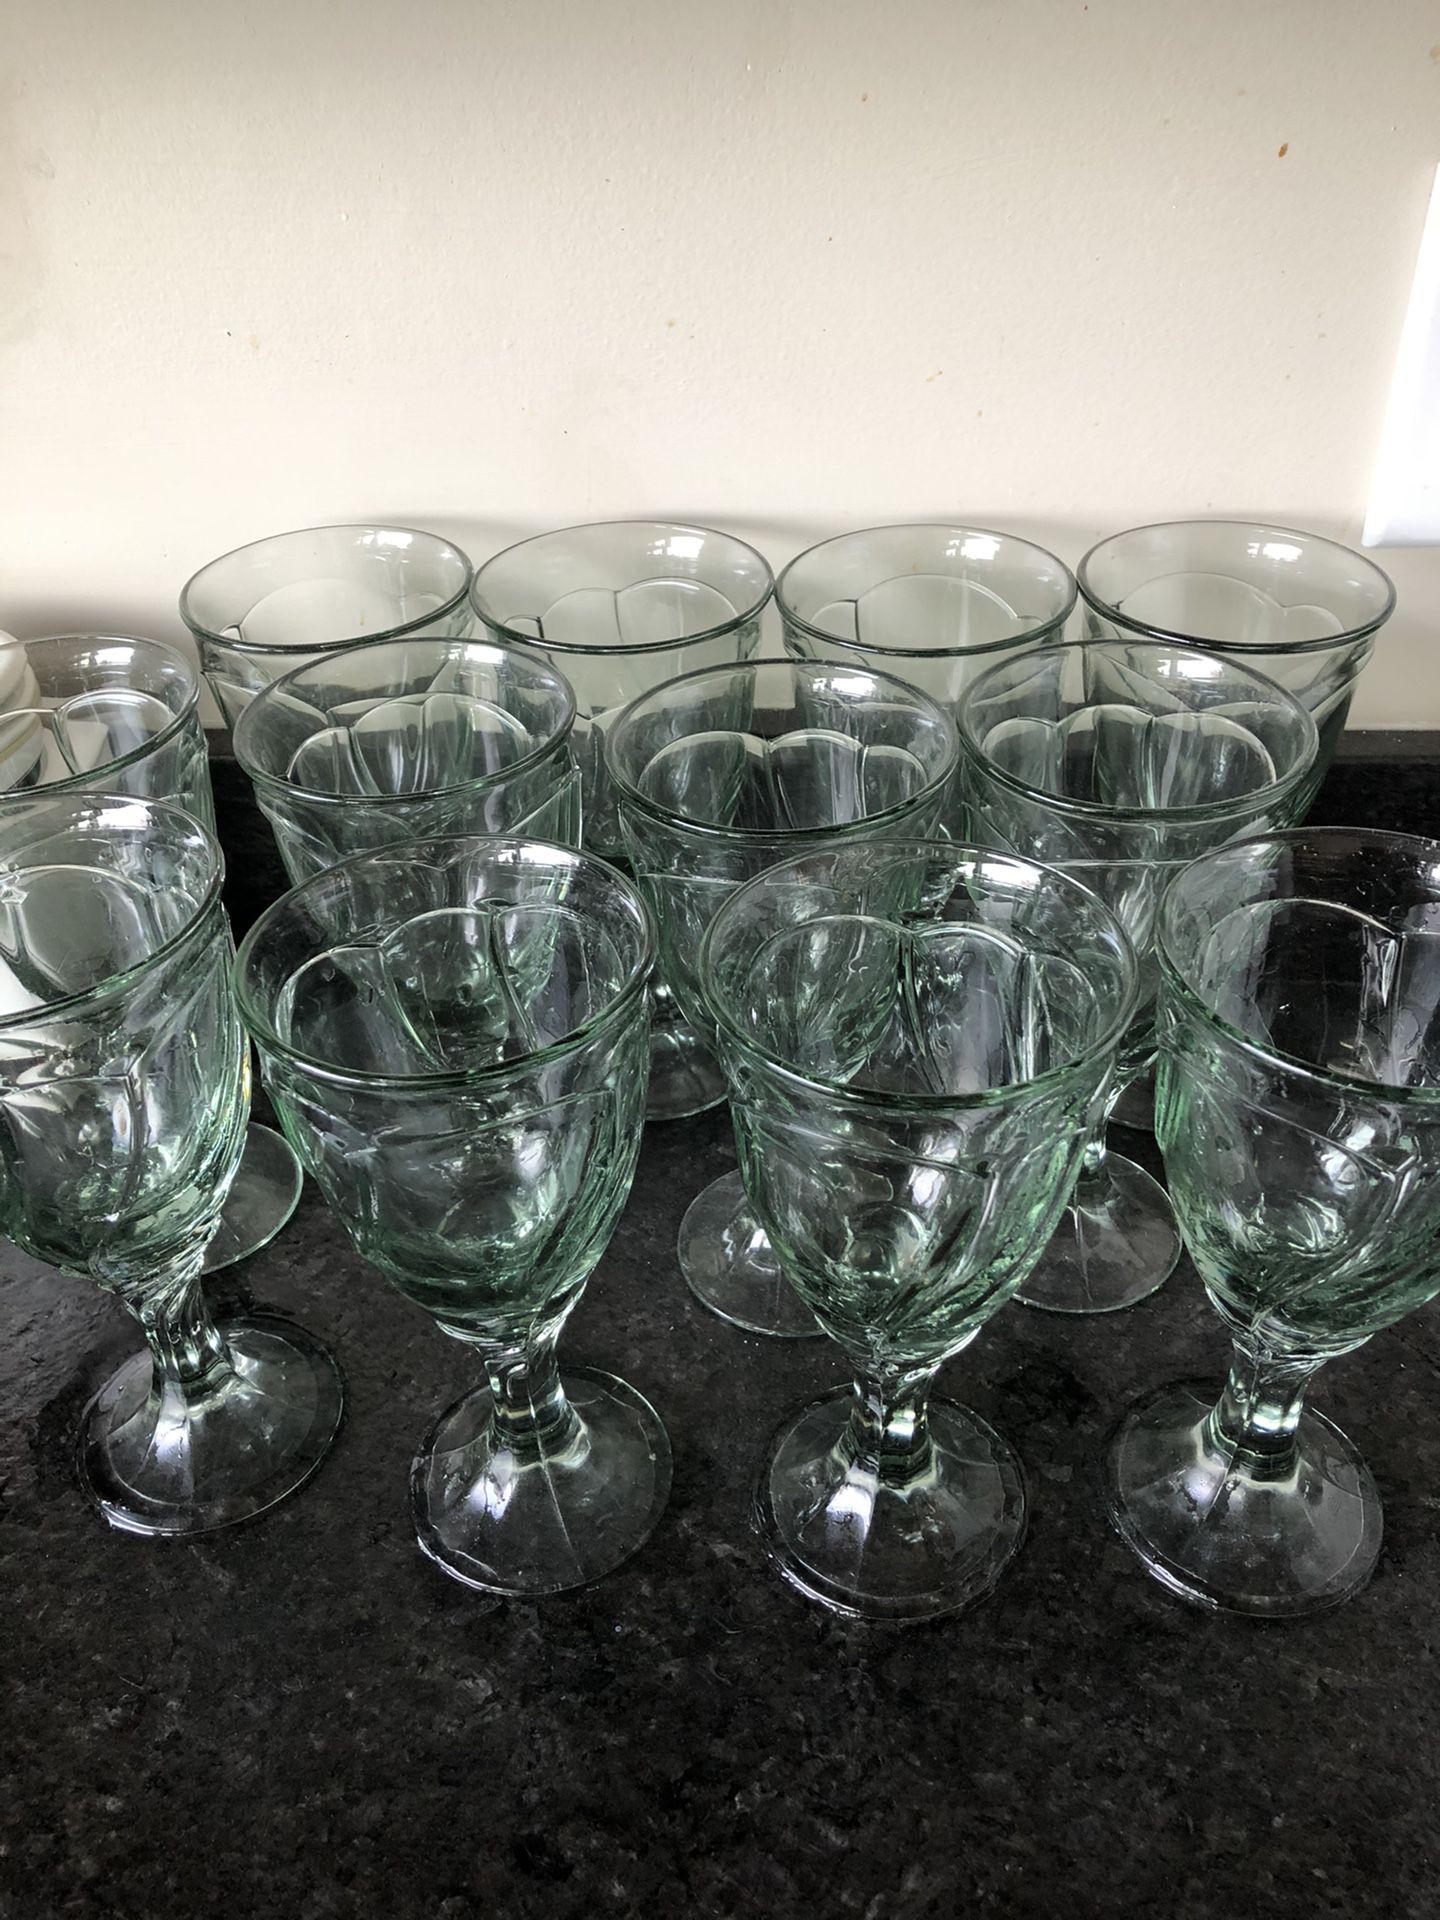 Light Green Sweet Swirl Iced Tea Goblets set of 12 by Noritake